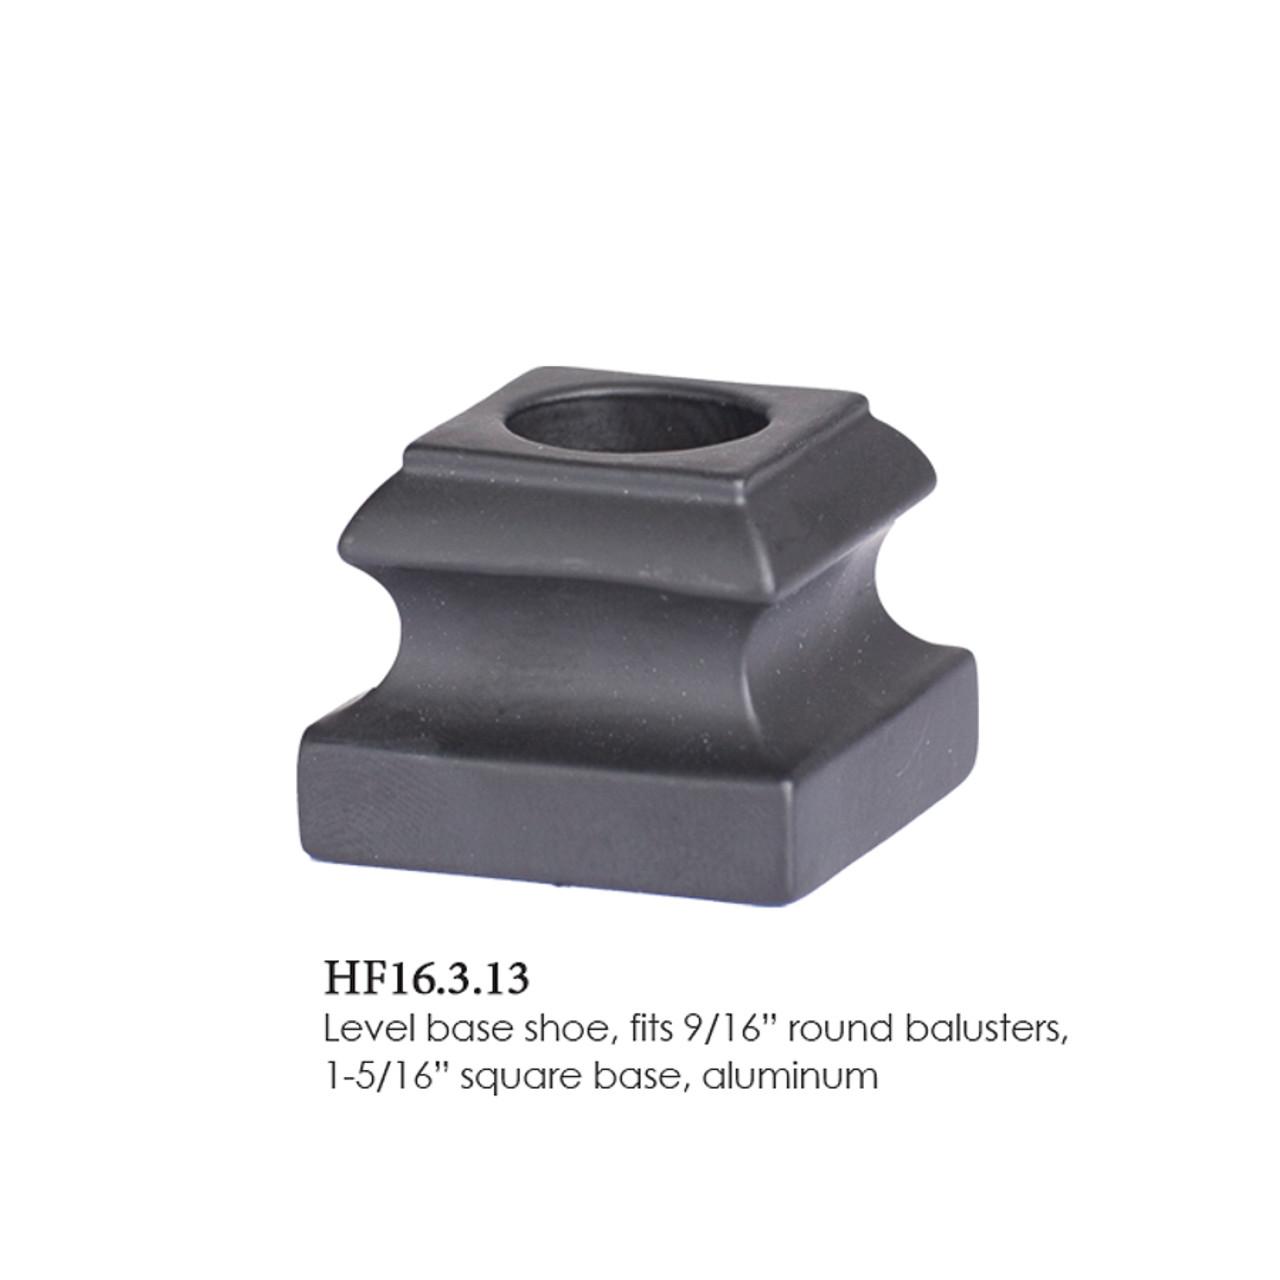 "HF16.3.13 Standard 9/16"" Opening Flat Round Shoe"